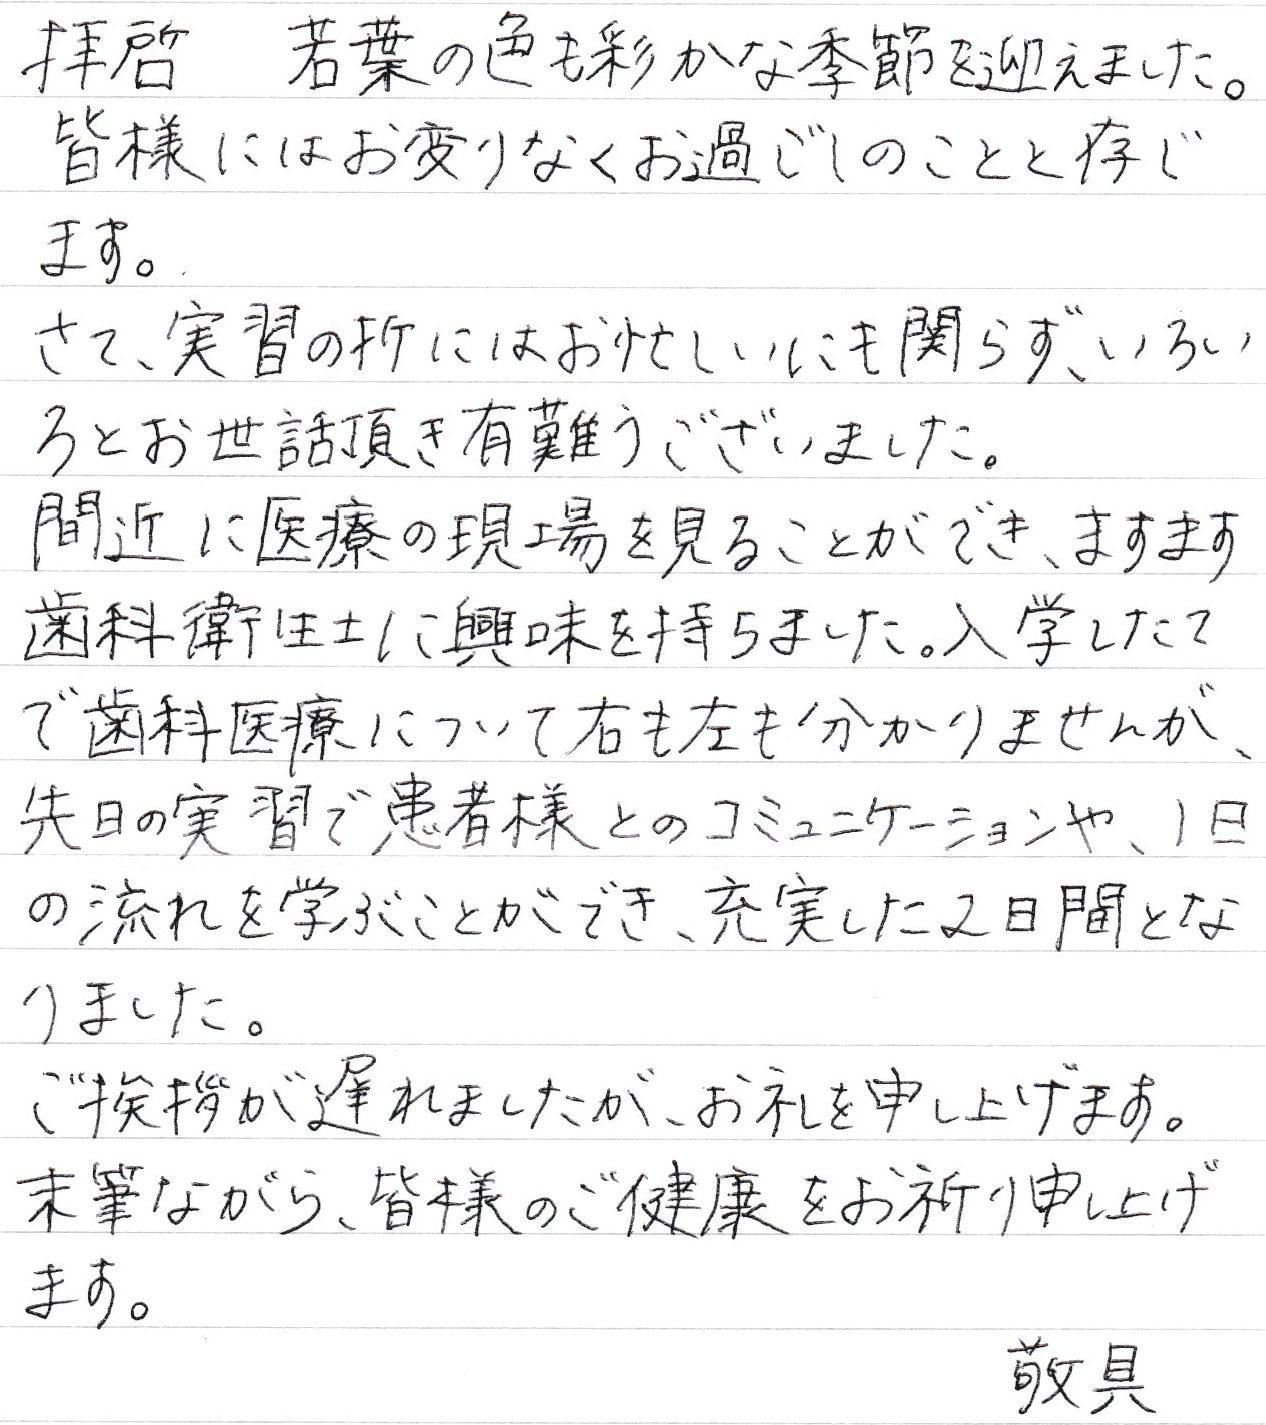 香川県歯科医療専門学校 K.Aさんの直筆感想文